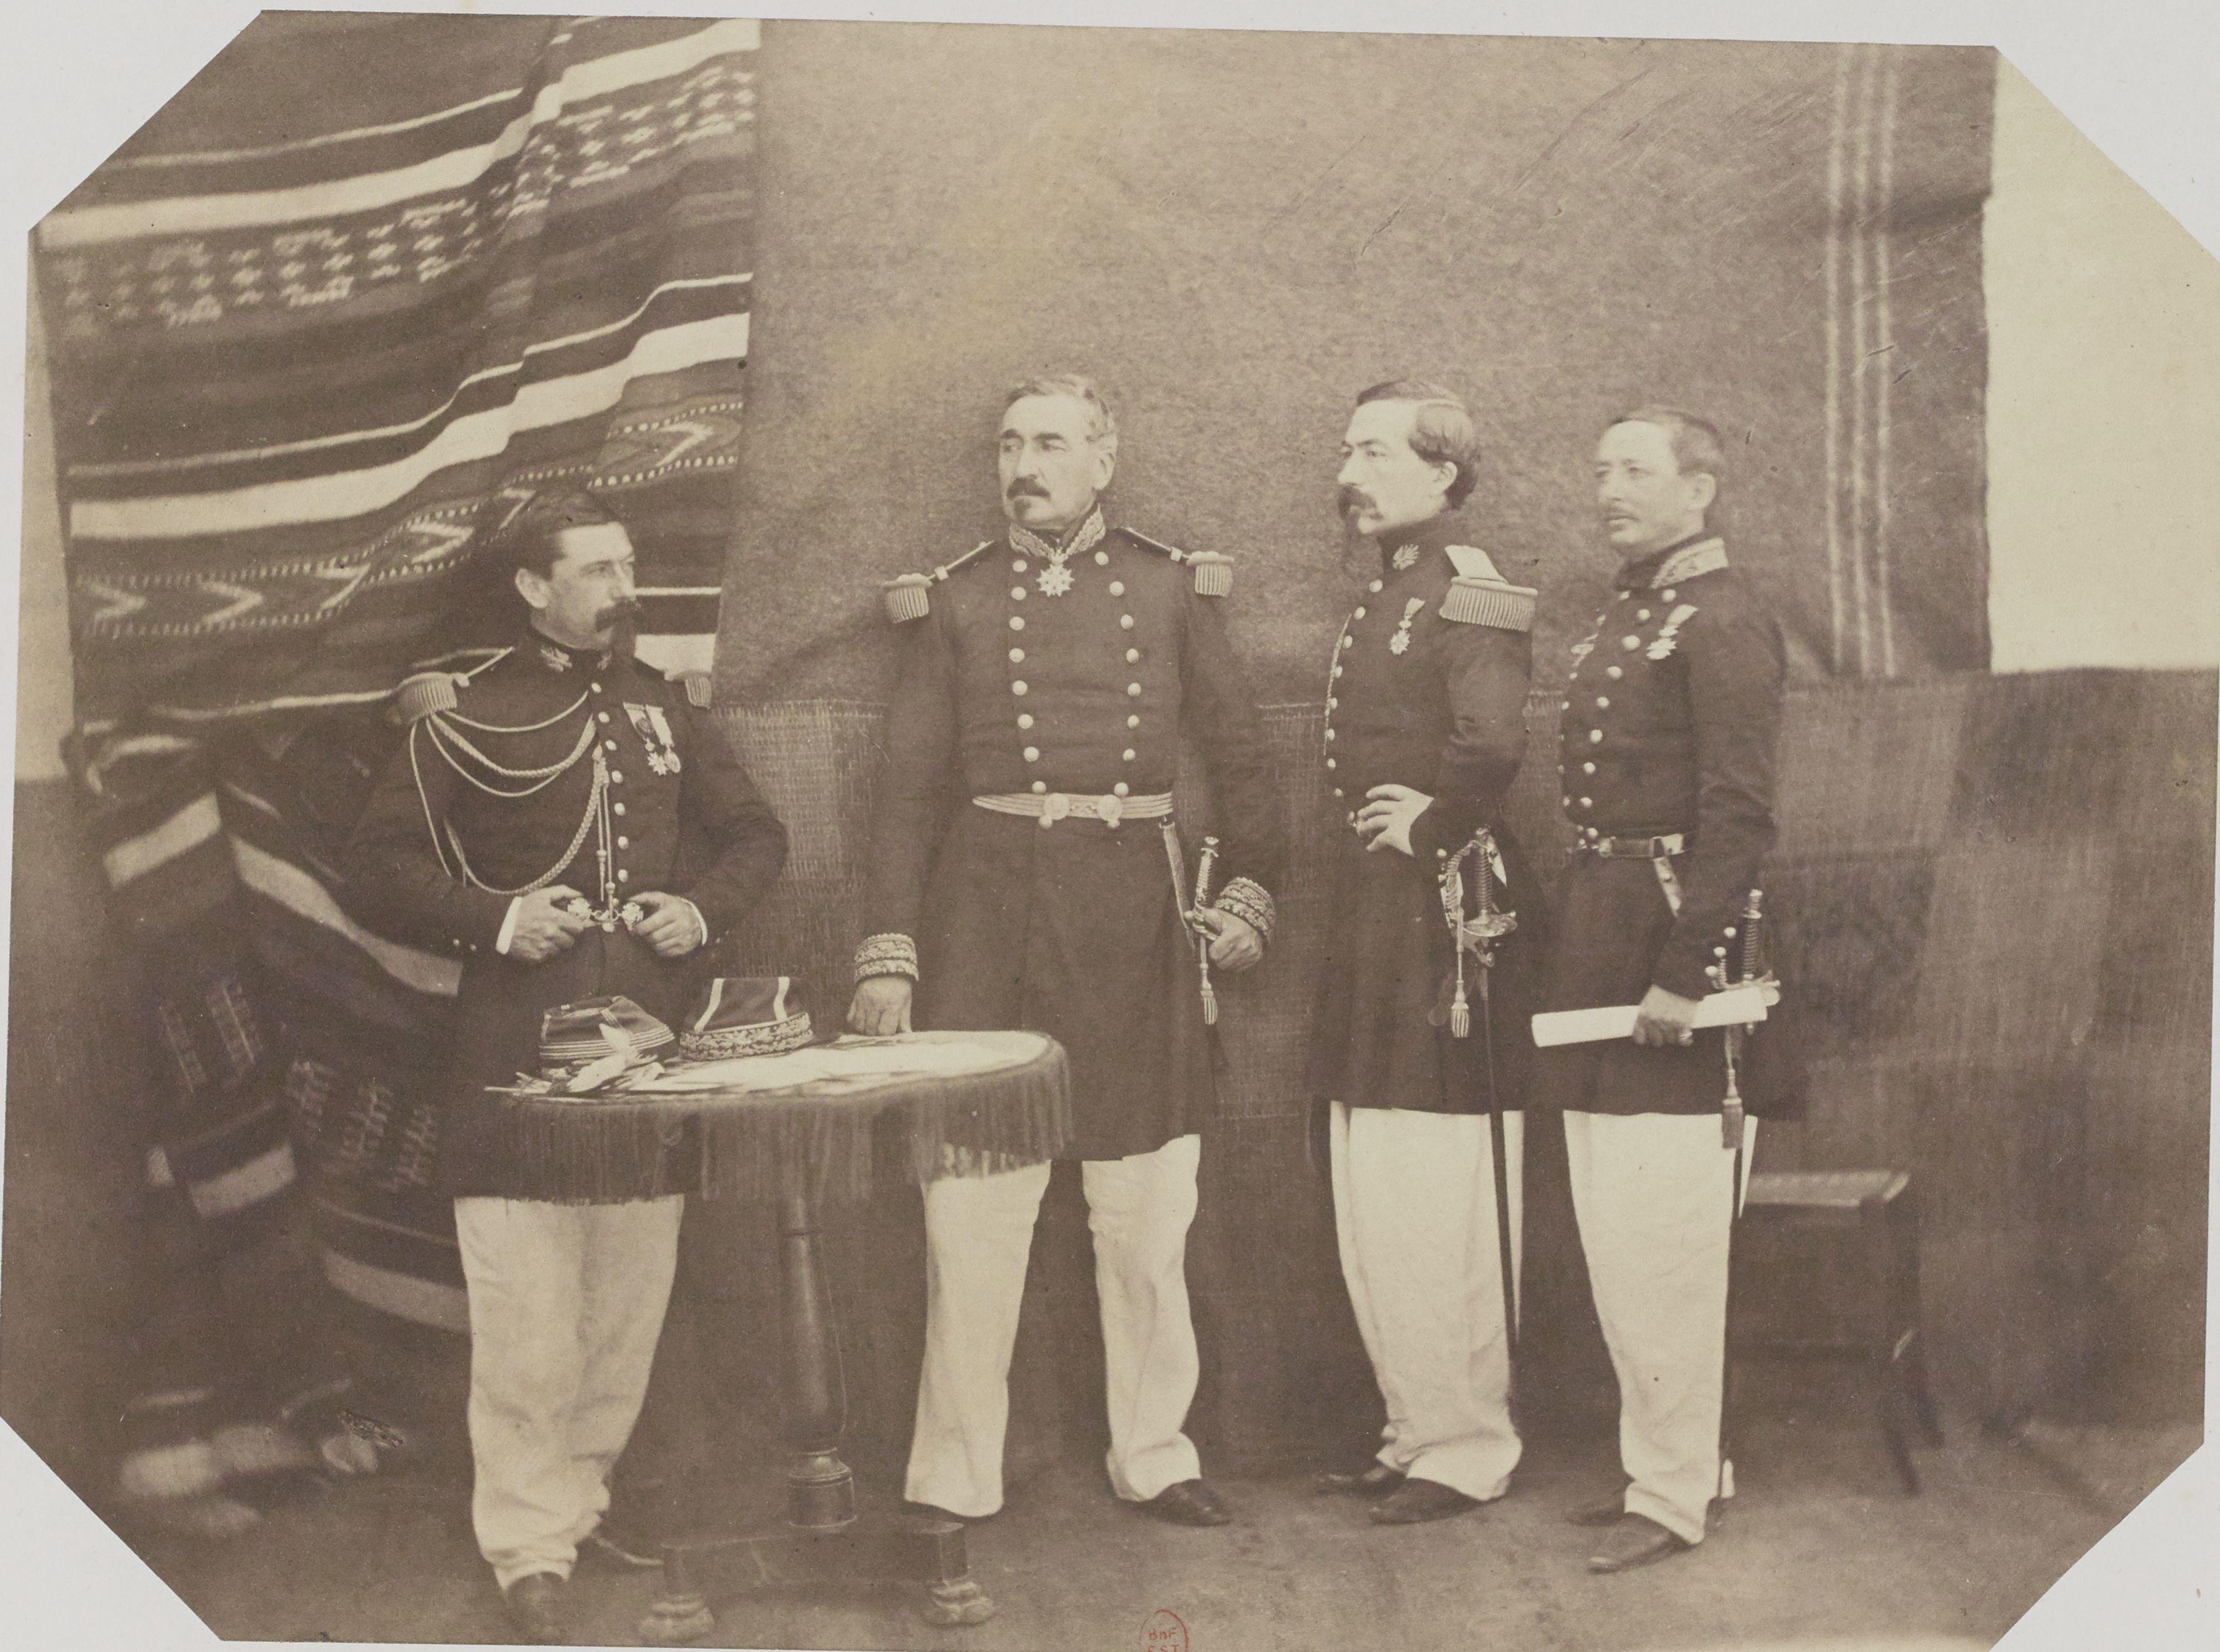 02. Дивизионный генерал Шарль Кузен-Монтабан и его офицеры. Оран